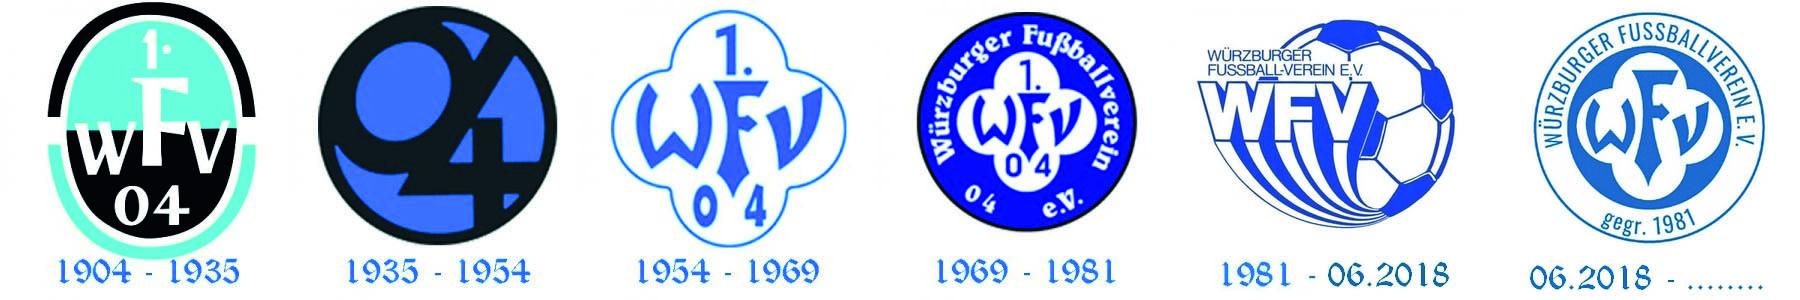 WFV Logos